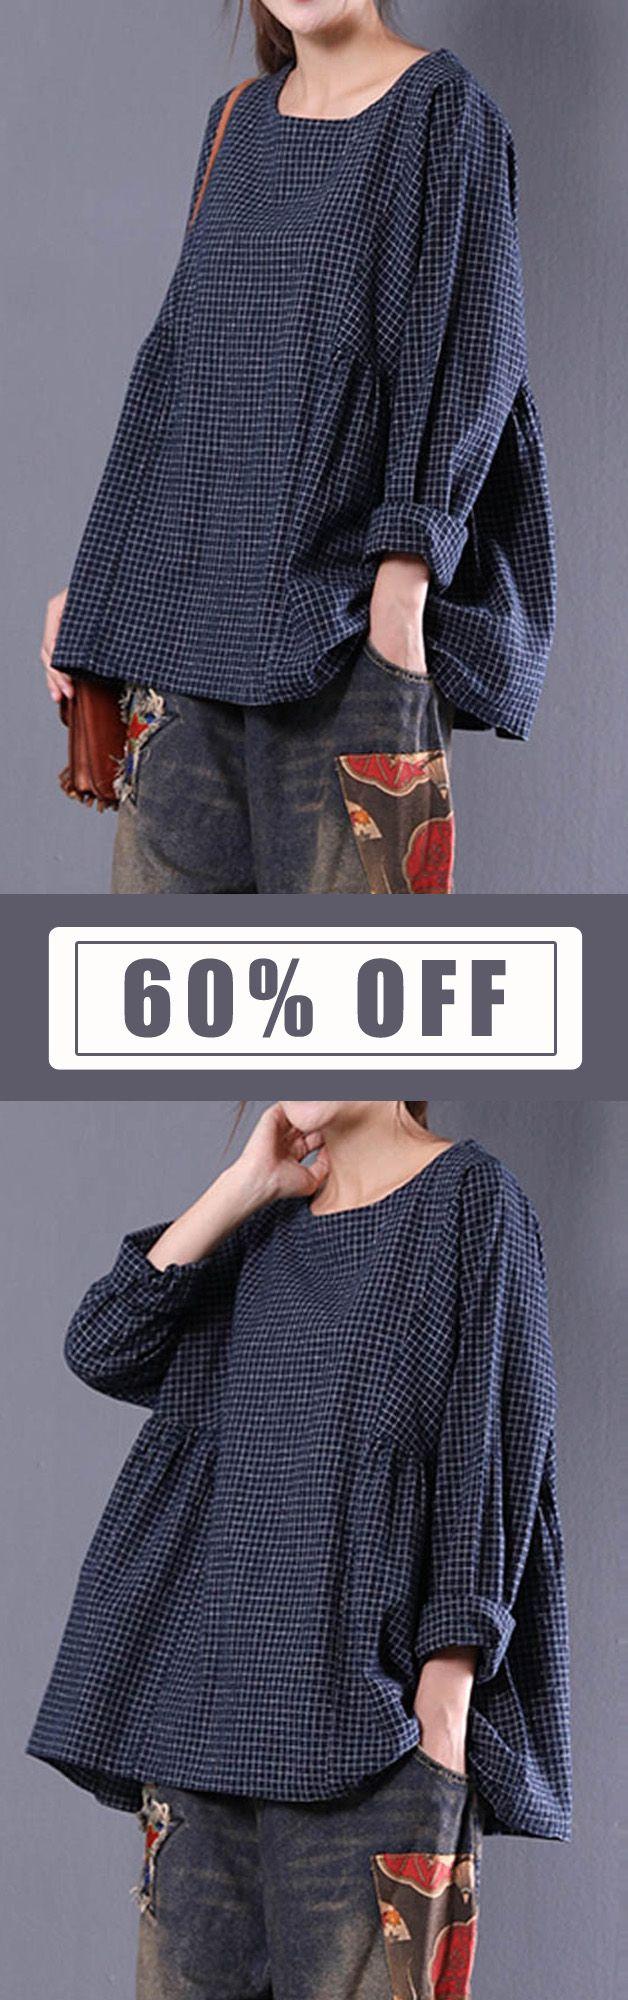 Women Crewneck Check Long Sleeve Loose Baggy Blouses. Casual Style, Loose Style, Long Sleeve, O-Neck. Color:Black,Blue. Size:M,L,XL,XXL,XXXL,XXXXL,5XL. Suitable in Fall, Spring, Winter. Buy now!  #women #blouse #fashion http://laboheme.life